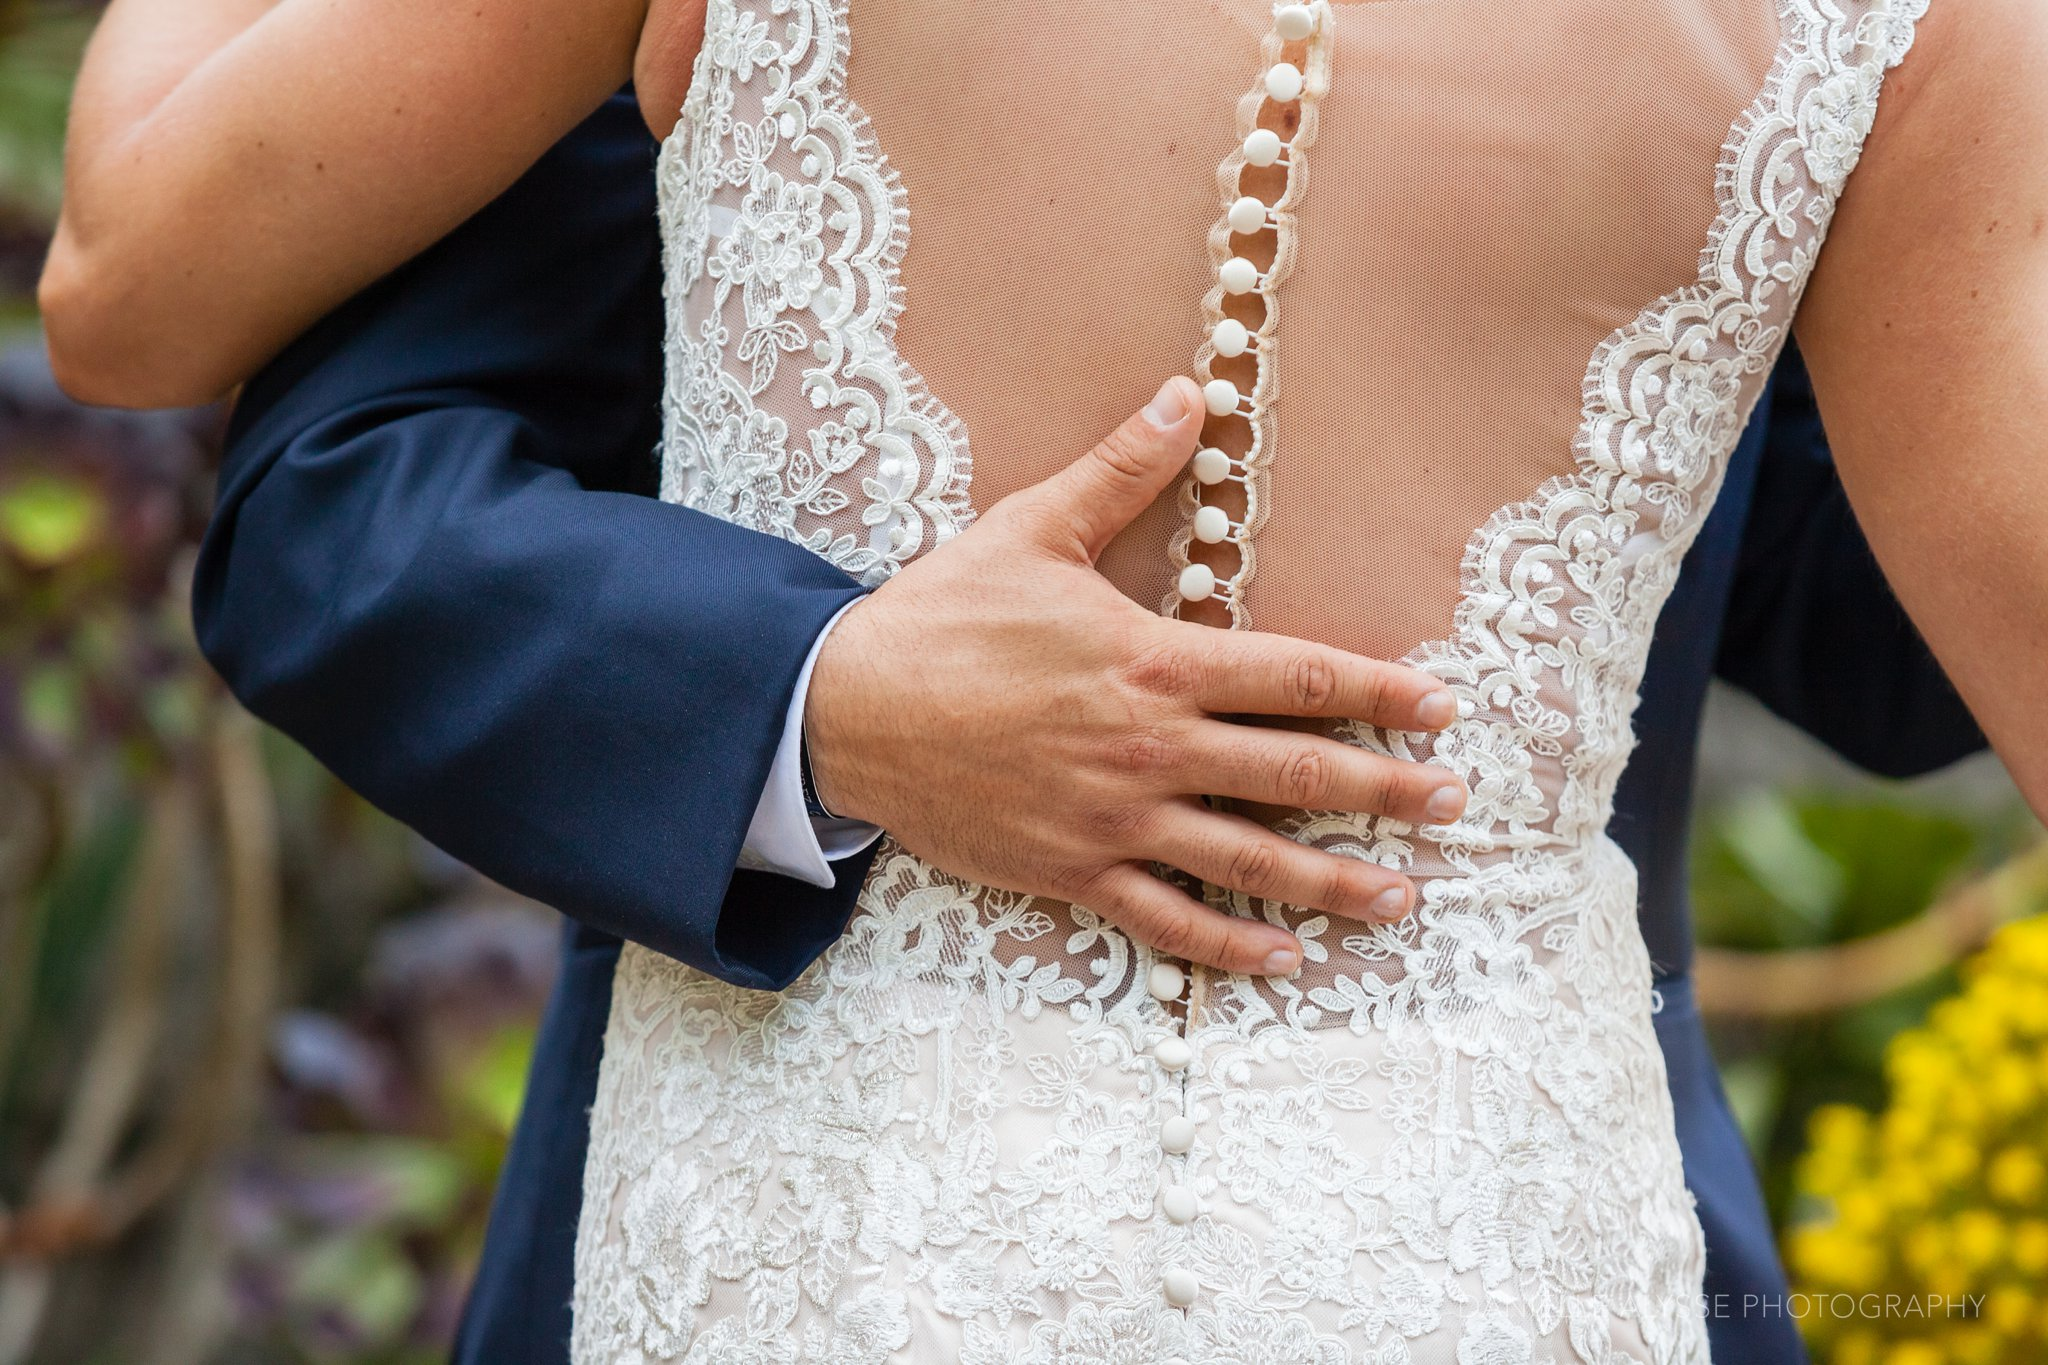 170429_blog_kimberly_ben_wedding_san_mateo_curiodyssey_danielle_alysse_photography_sacramento_photographer0410_WEB.jpg